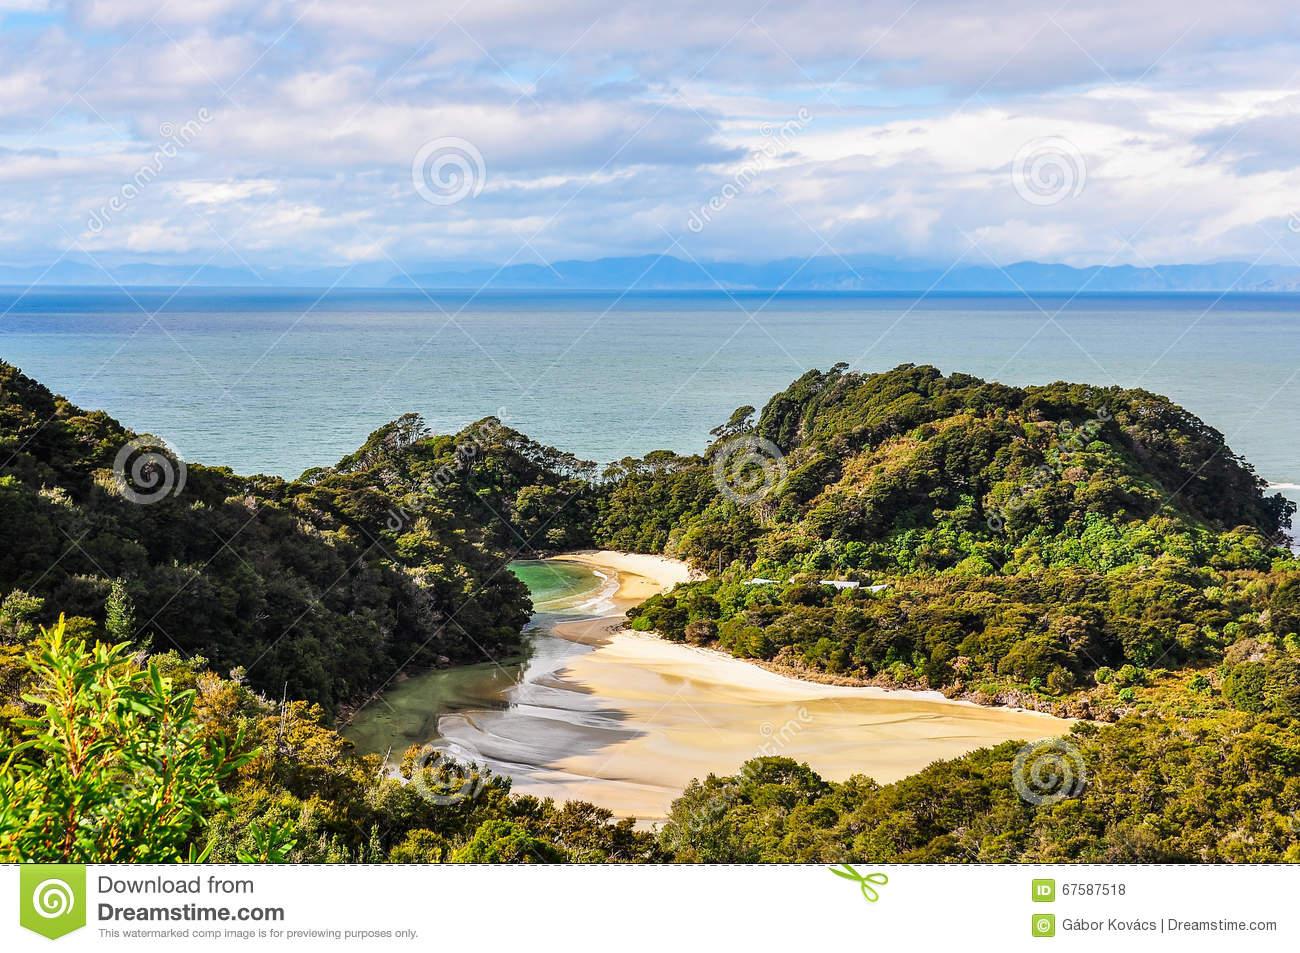 Abel tasman national park clipart #5